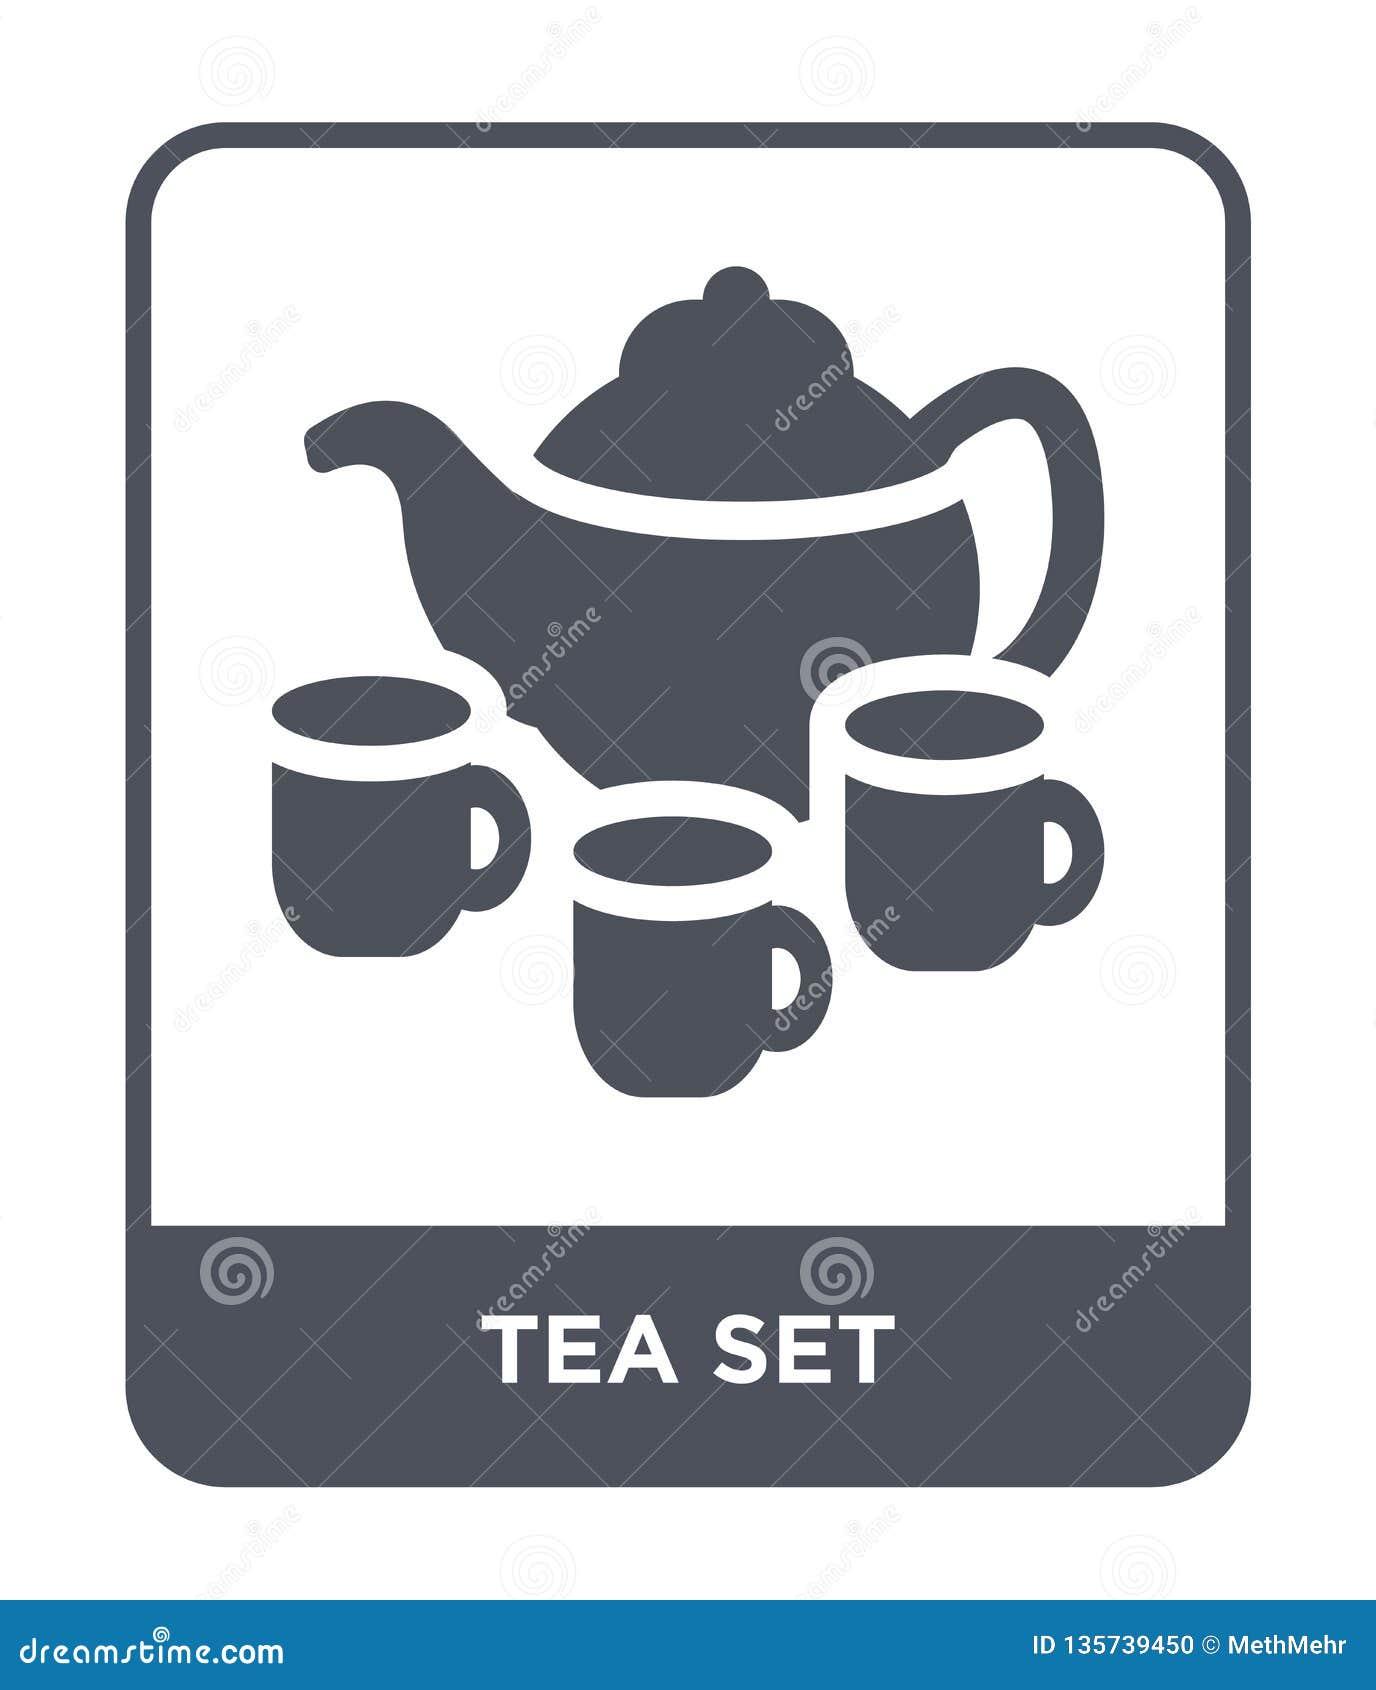 Teservissymbol i moderiktig designstil teservissymbol som isoleras på vit bakgrund enkelt och modernt plant symbol för teservisve